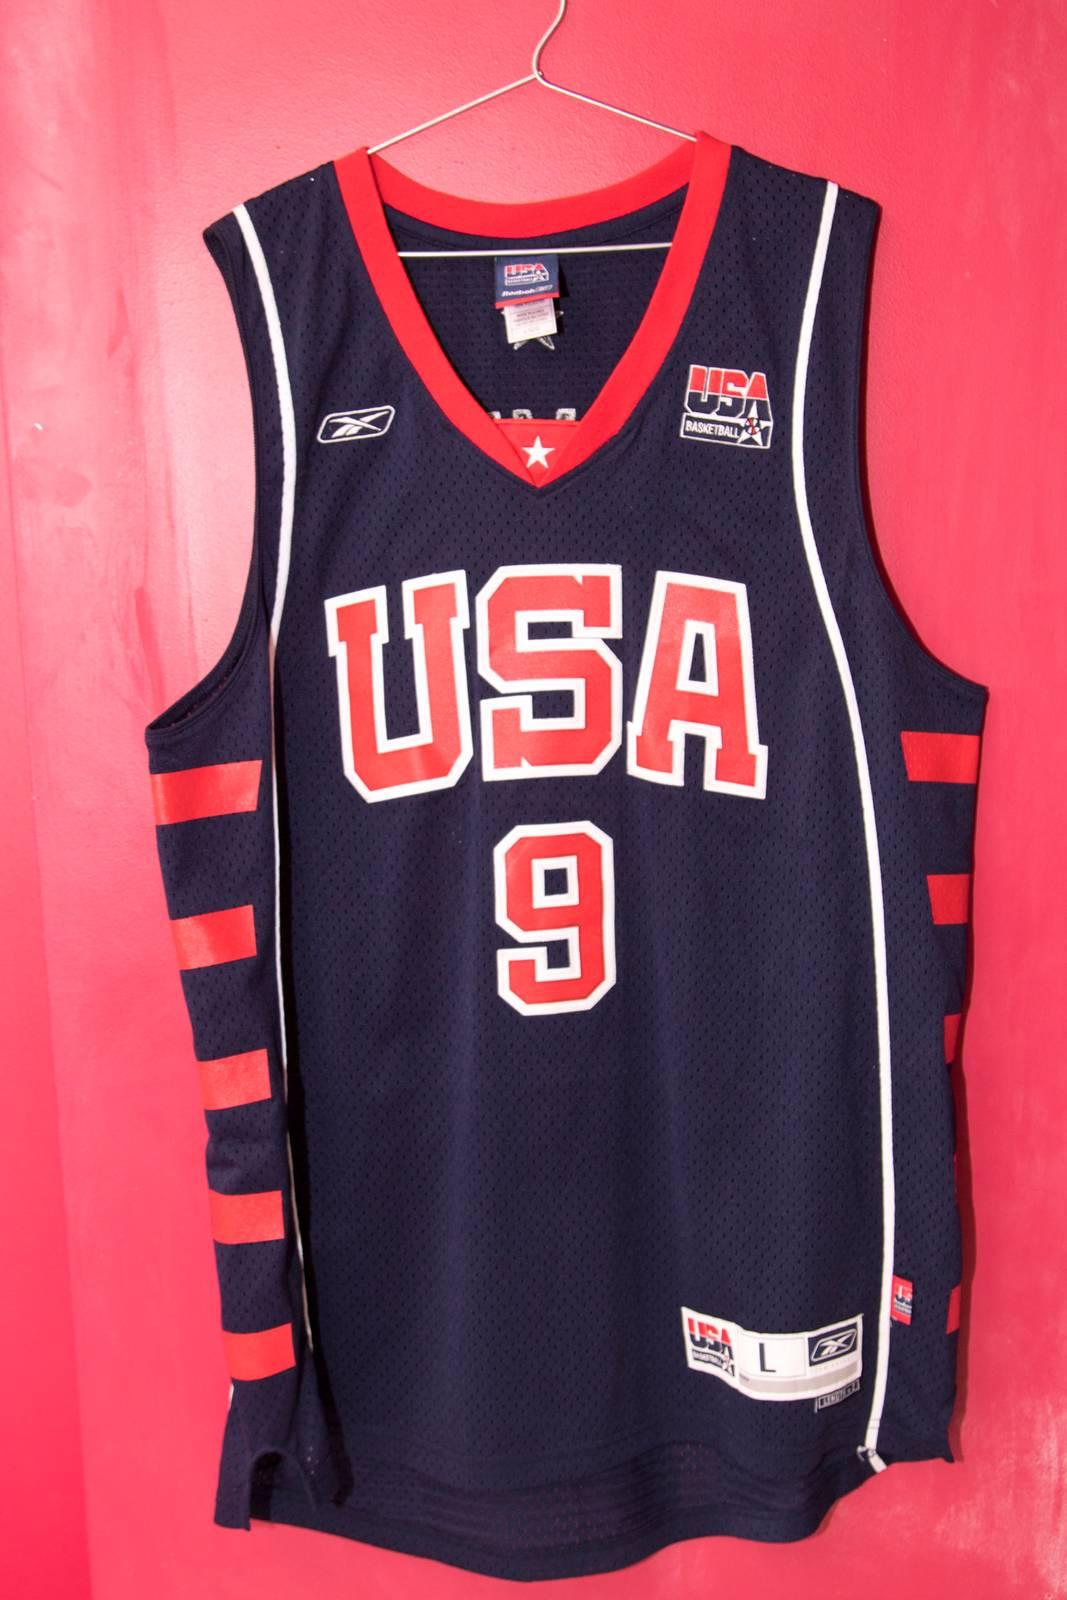 lebron usa jersey. 2004 usa olympic basketball team lebron james jersey - photo 1/5 usa